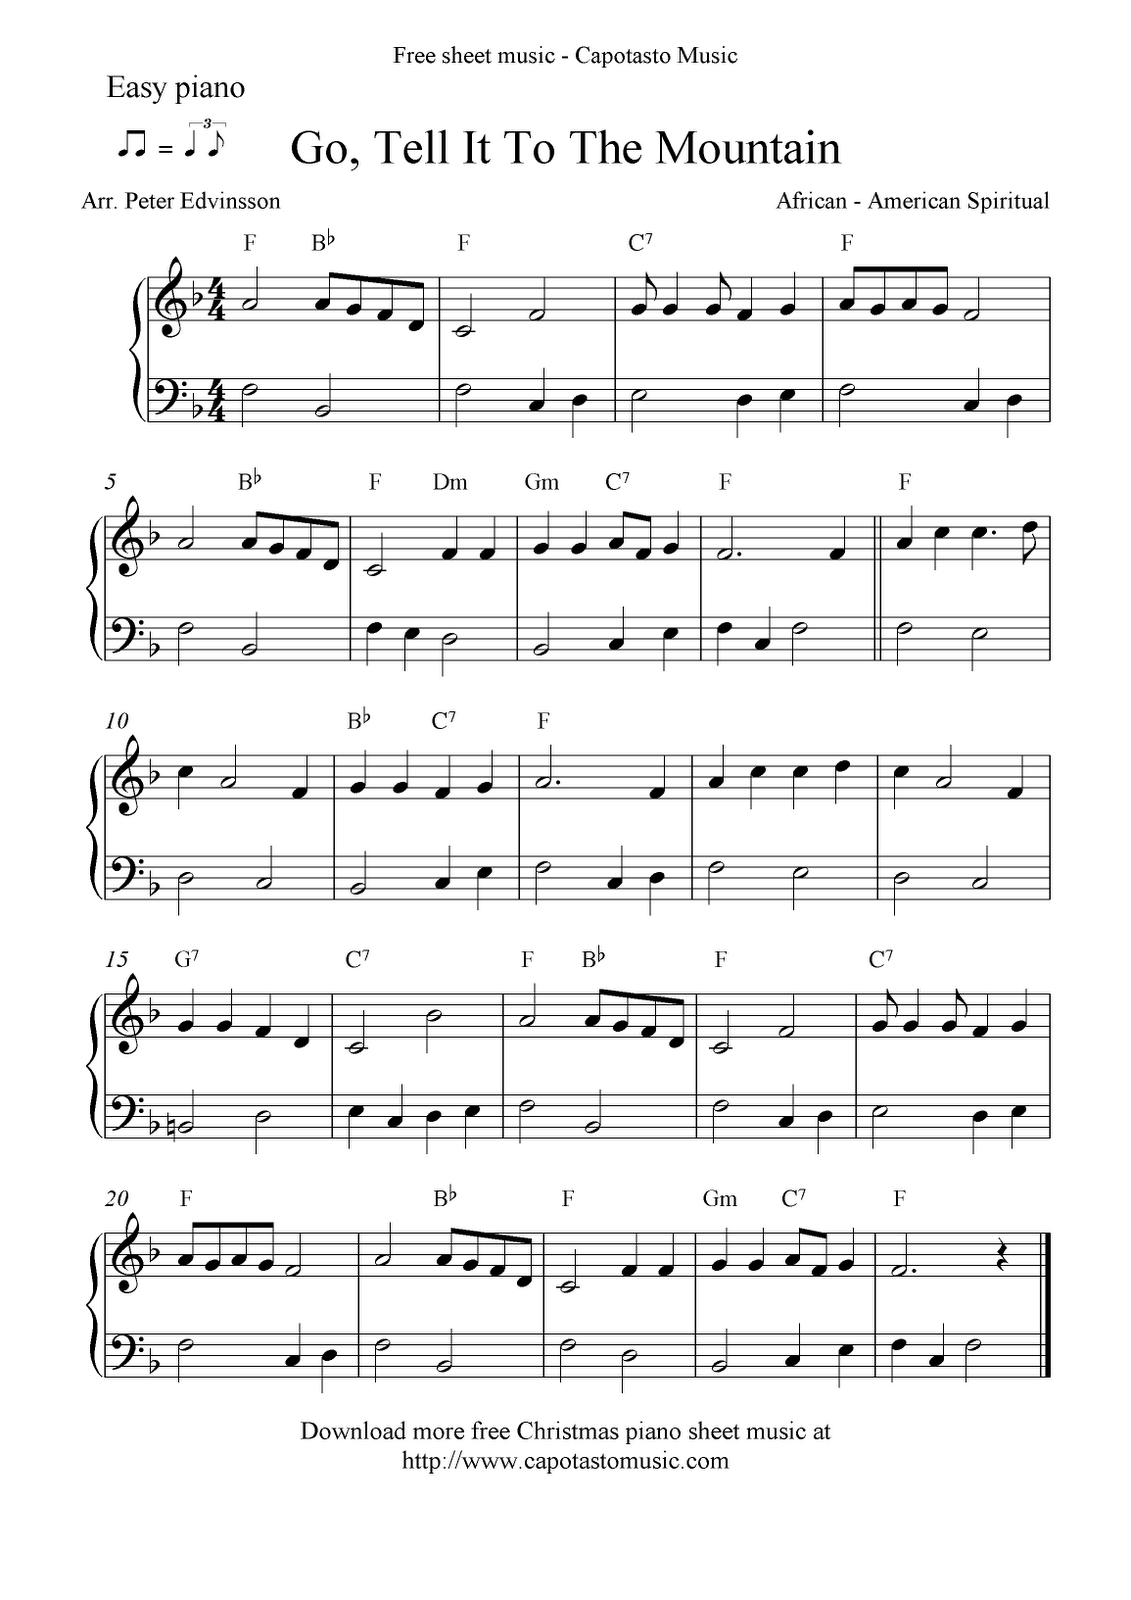 Free Printable Piano Sheet Music | Free Sheet Music Scores: Easy - Free Printable Gospel Sheet Music For Piano